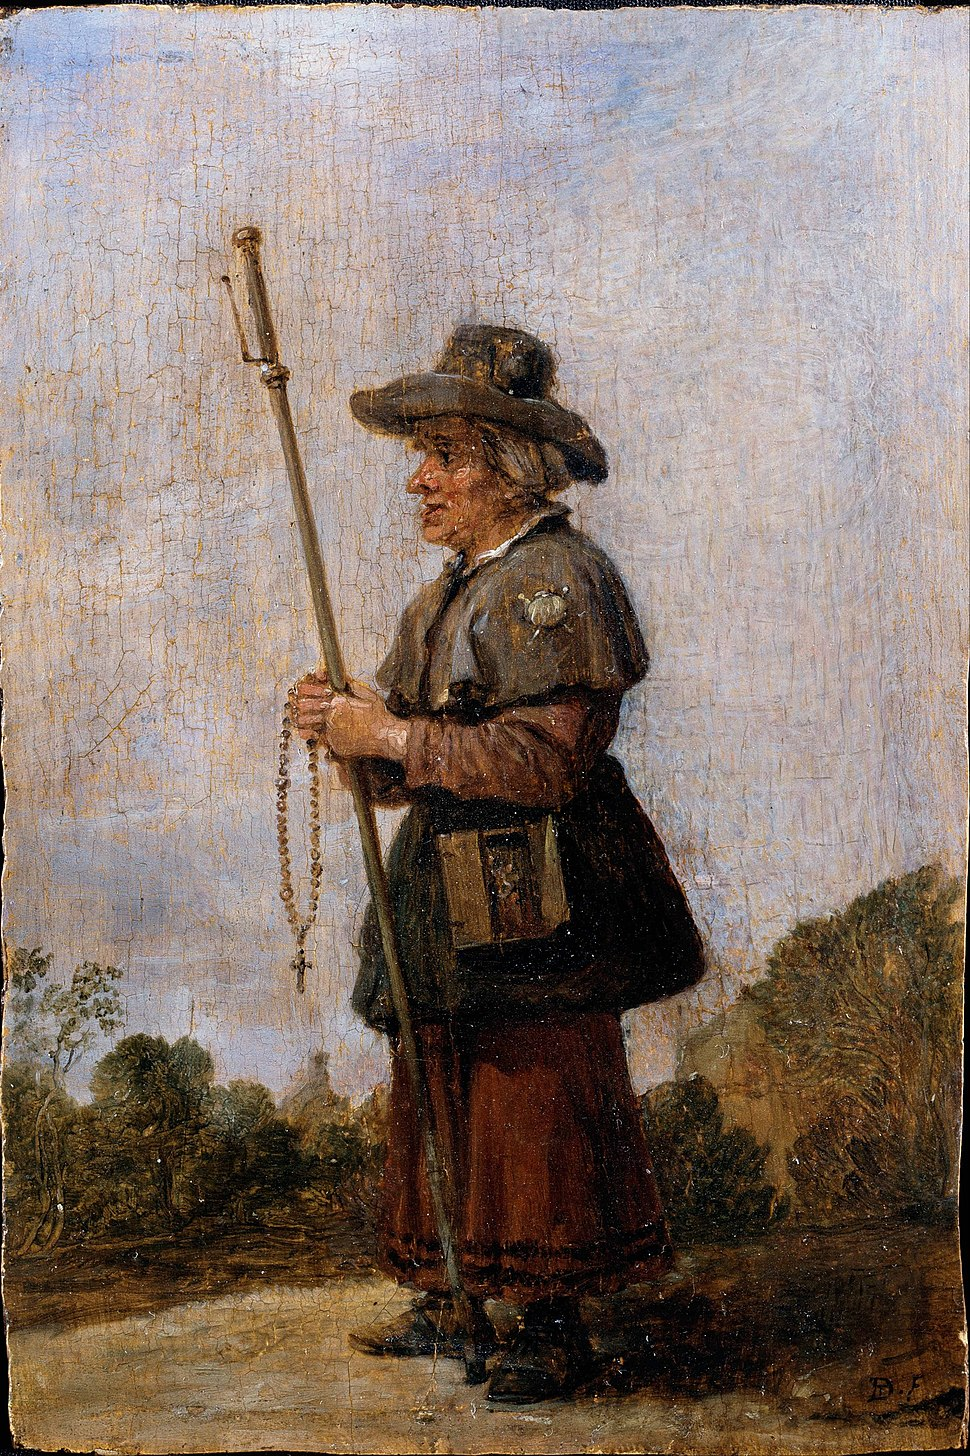 Teniers, David the younger - Female Pilgrim - Google Art Project